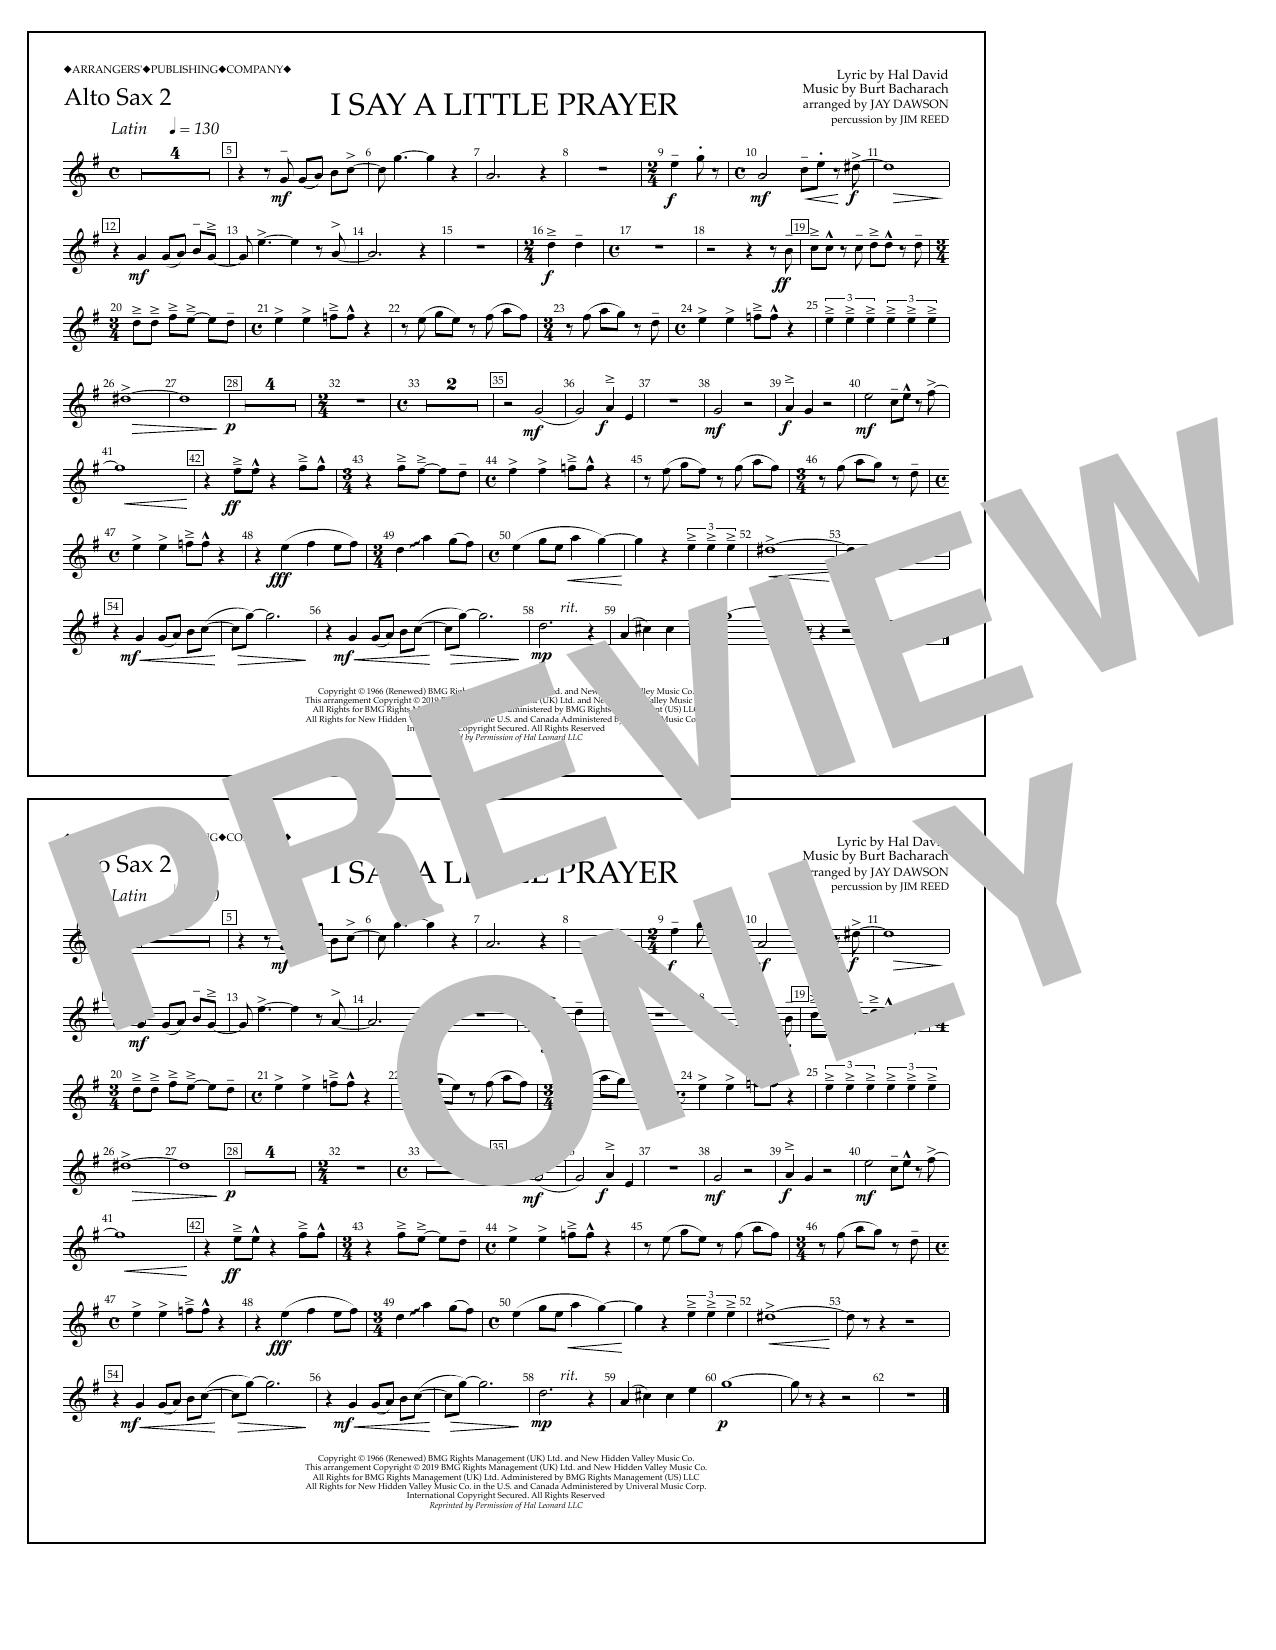 Aretha Franklin I Say a Little Prayer (arr. Jay Dawson) - Alto Sax 2 sheet music notes and chords. Download Printable PDF.